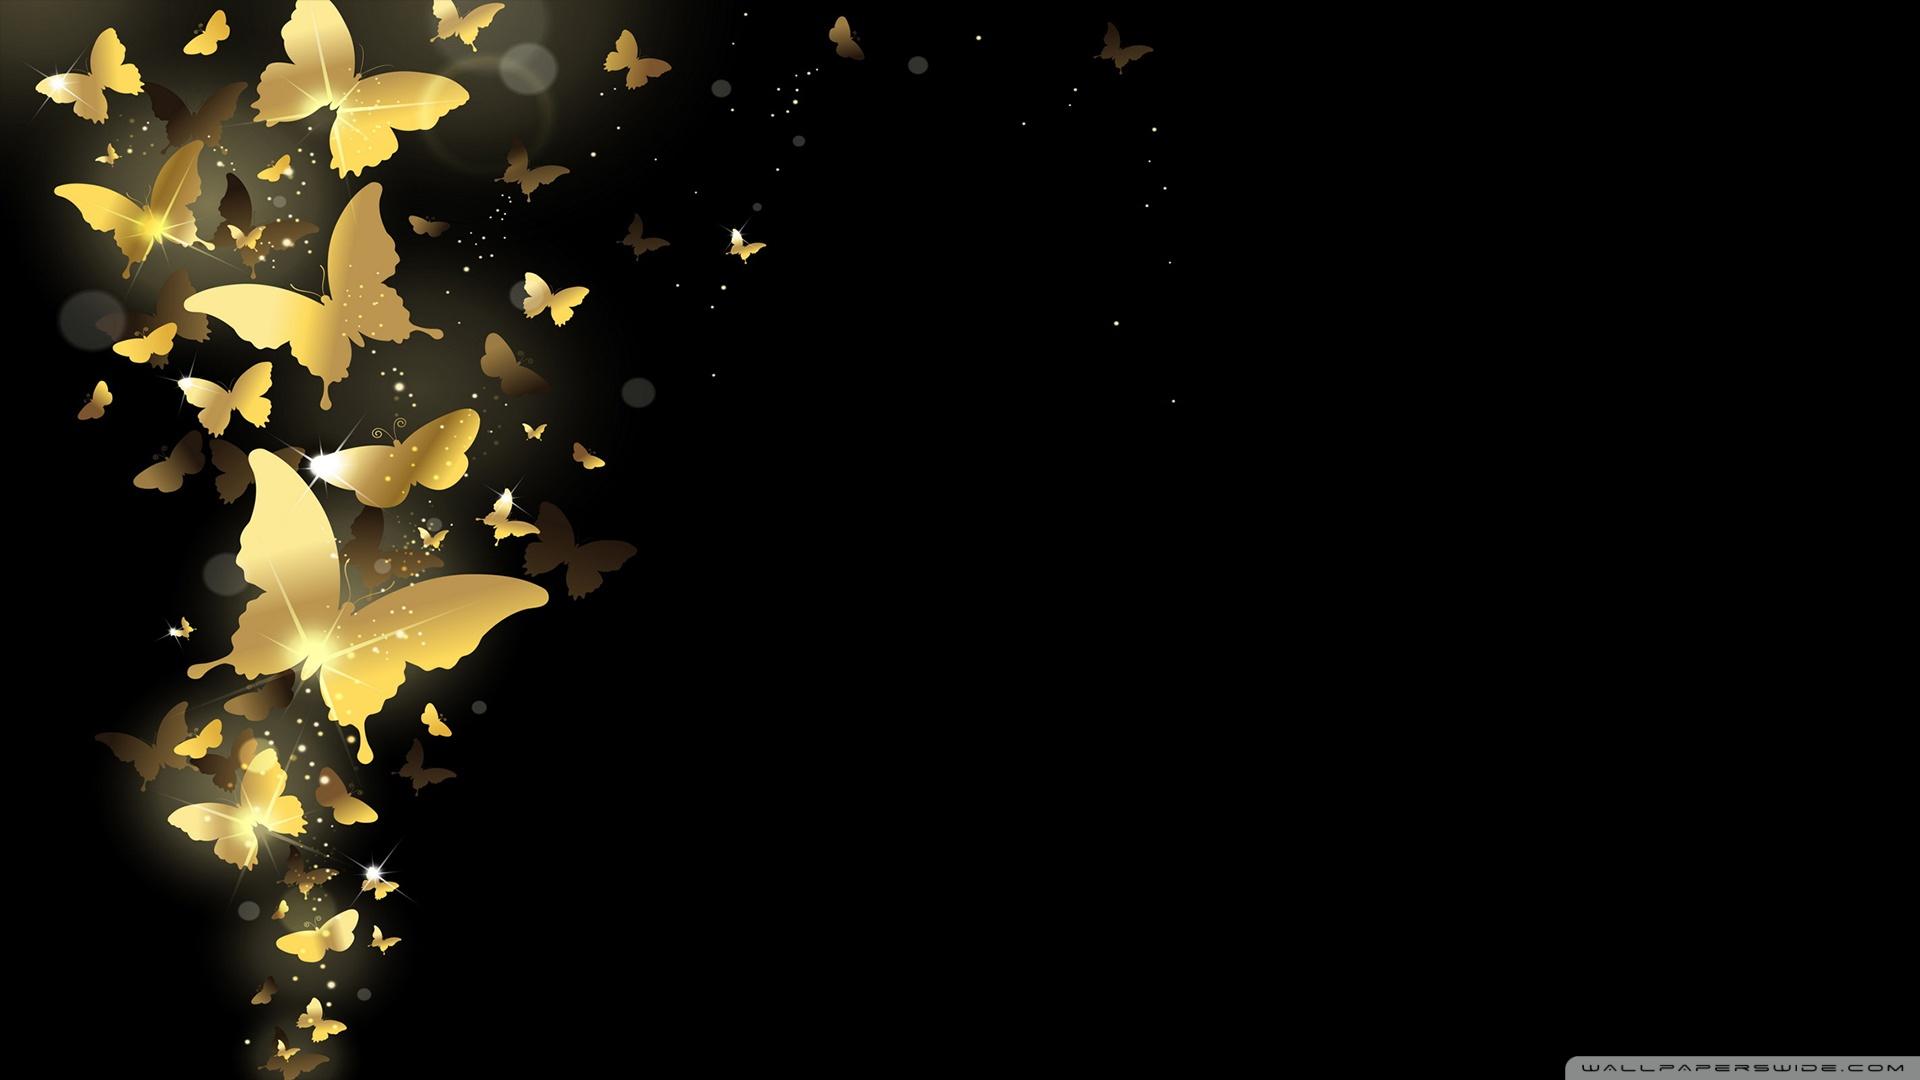 Dark Butterfly Wallpapers Hd 1920x1080 Wallpaper Teahub Io